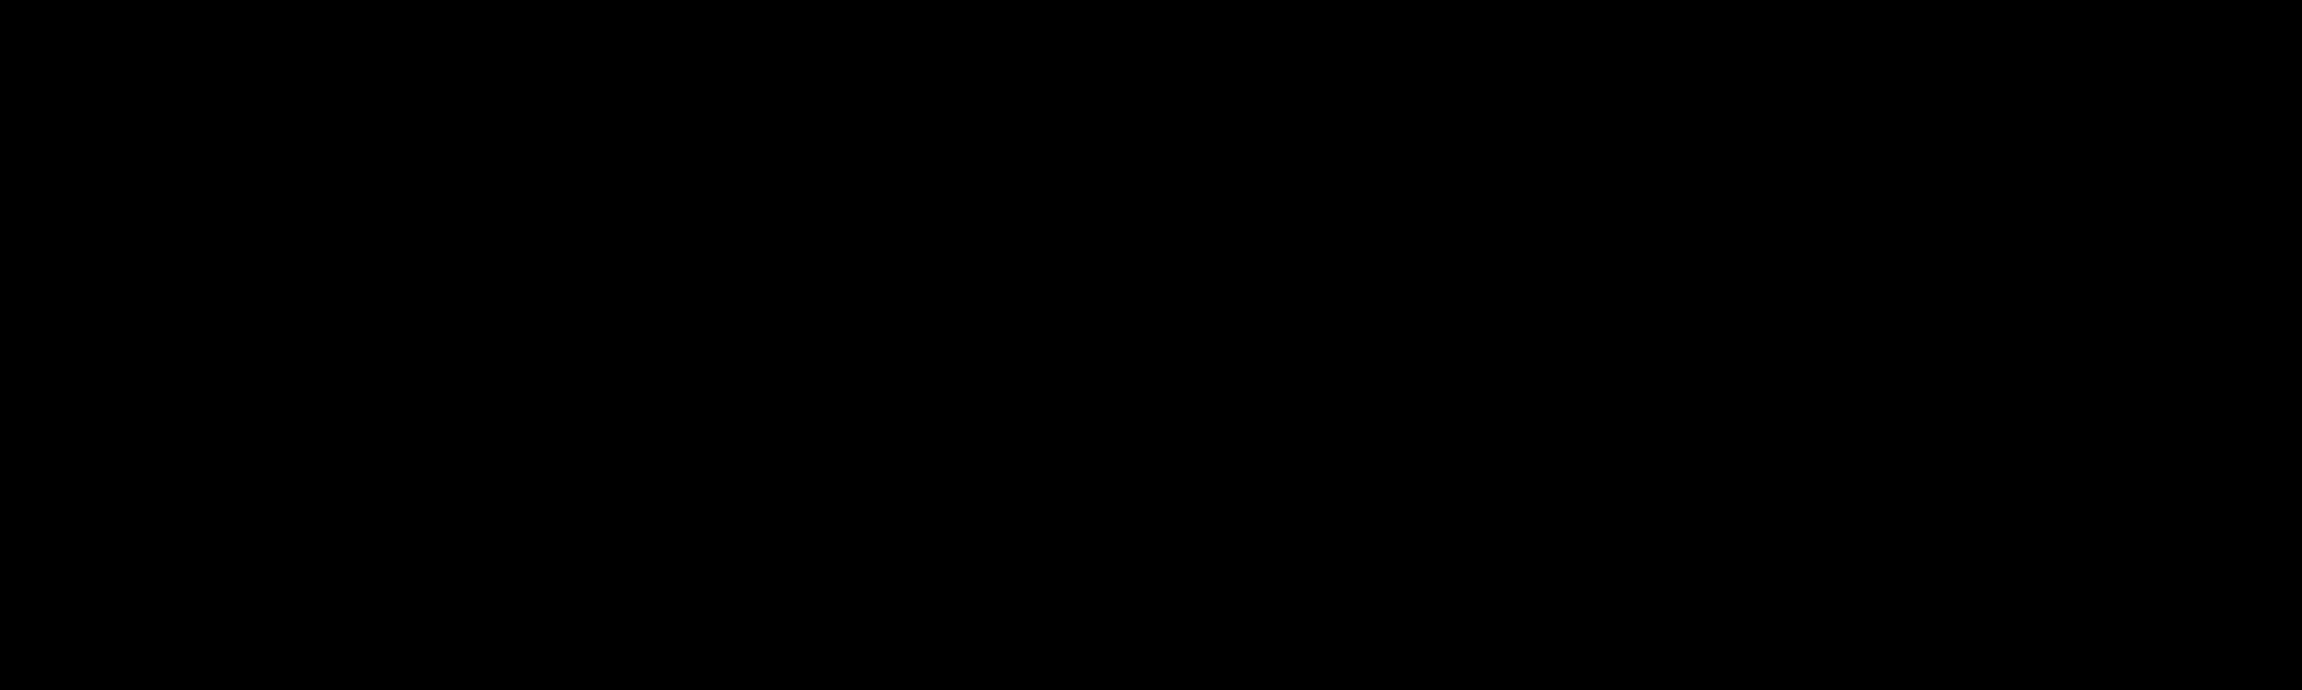 Aripiprazole N,N-dioxide-d<sub>8</sub> (piperazine-d<sub>8</sub>)